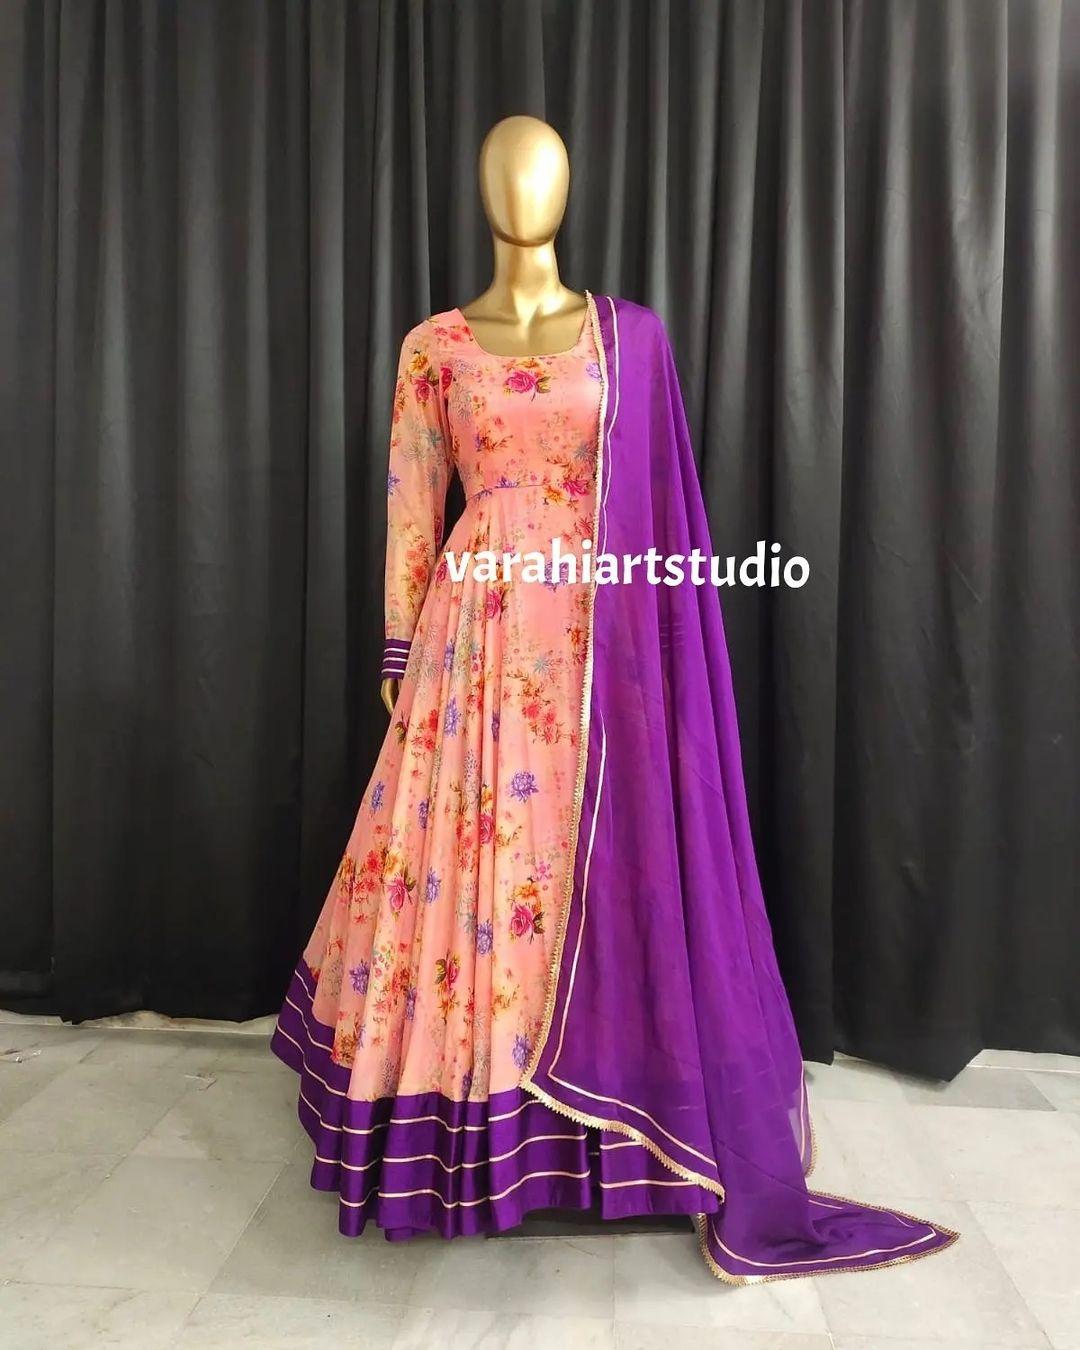 Beautiful blush pink color floral floor length anarkali dress with purple dupatta. 2021-07-20